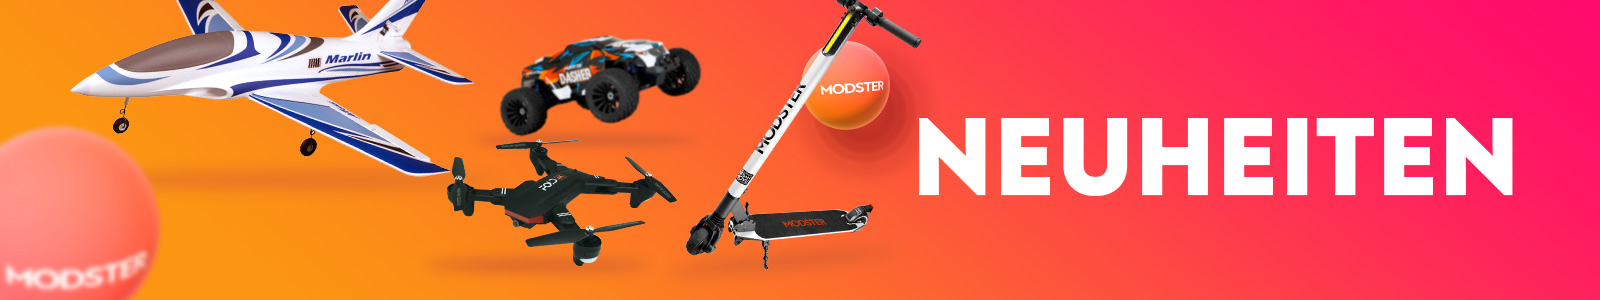 Modster-Neuheit-New-in-RC-Modellbau-Modellsport-Ferngesteuert